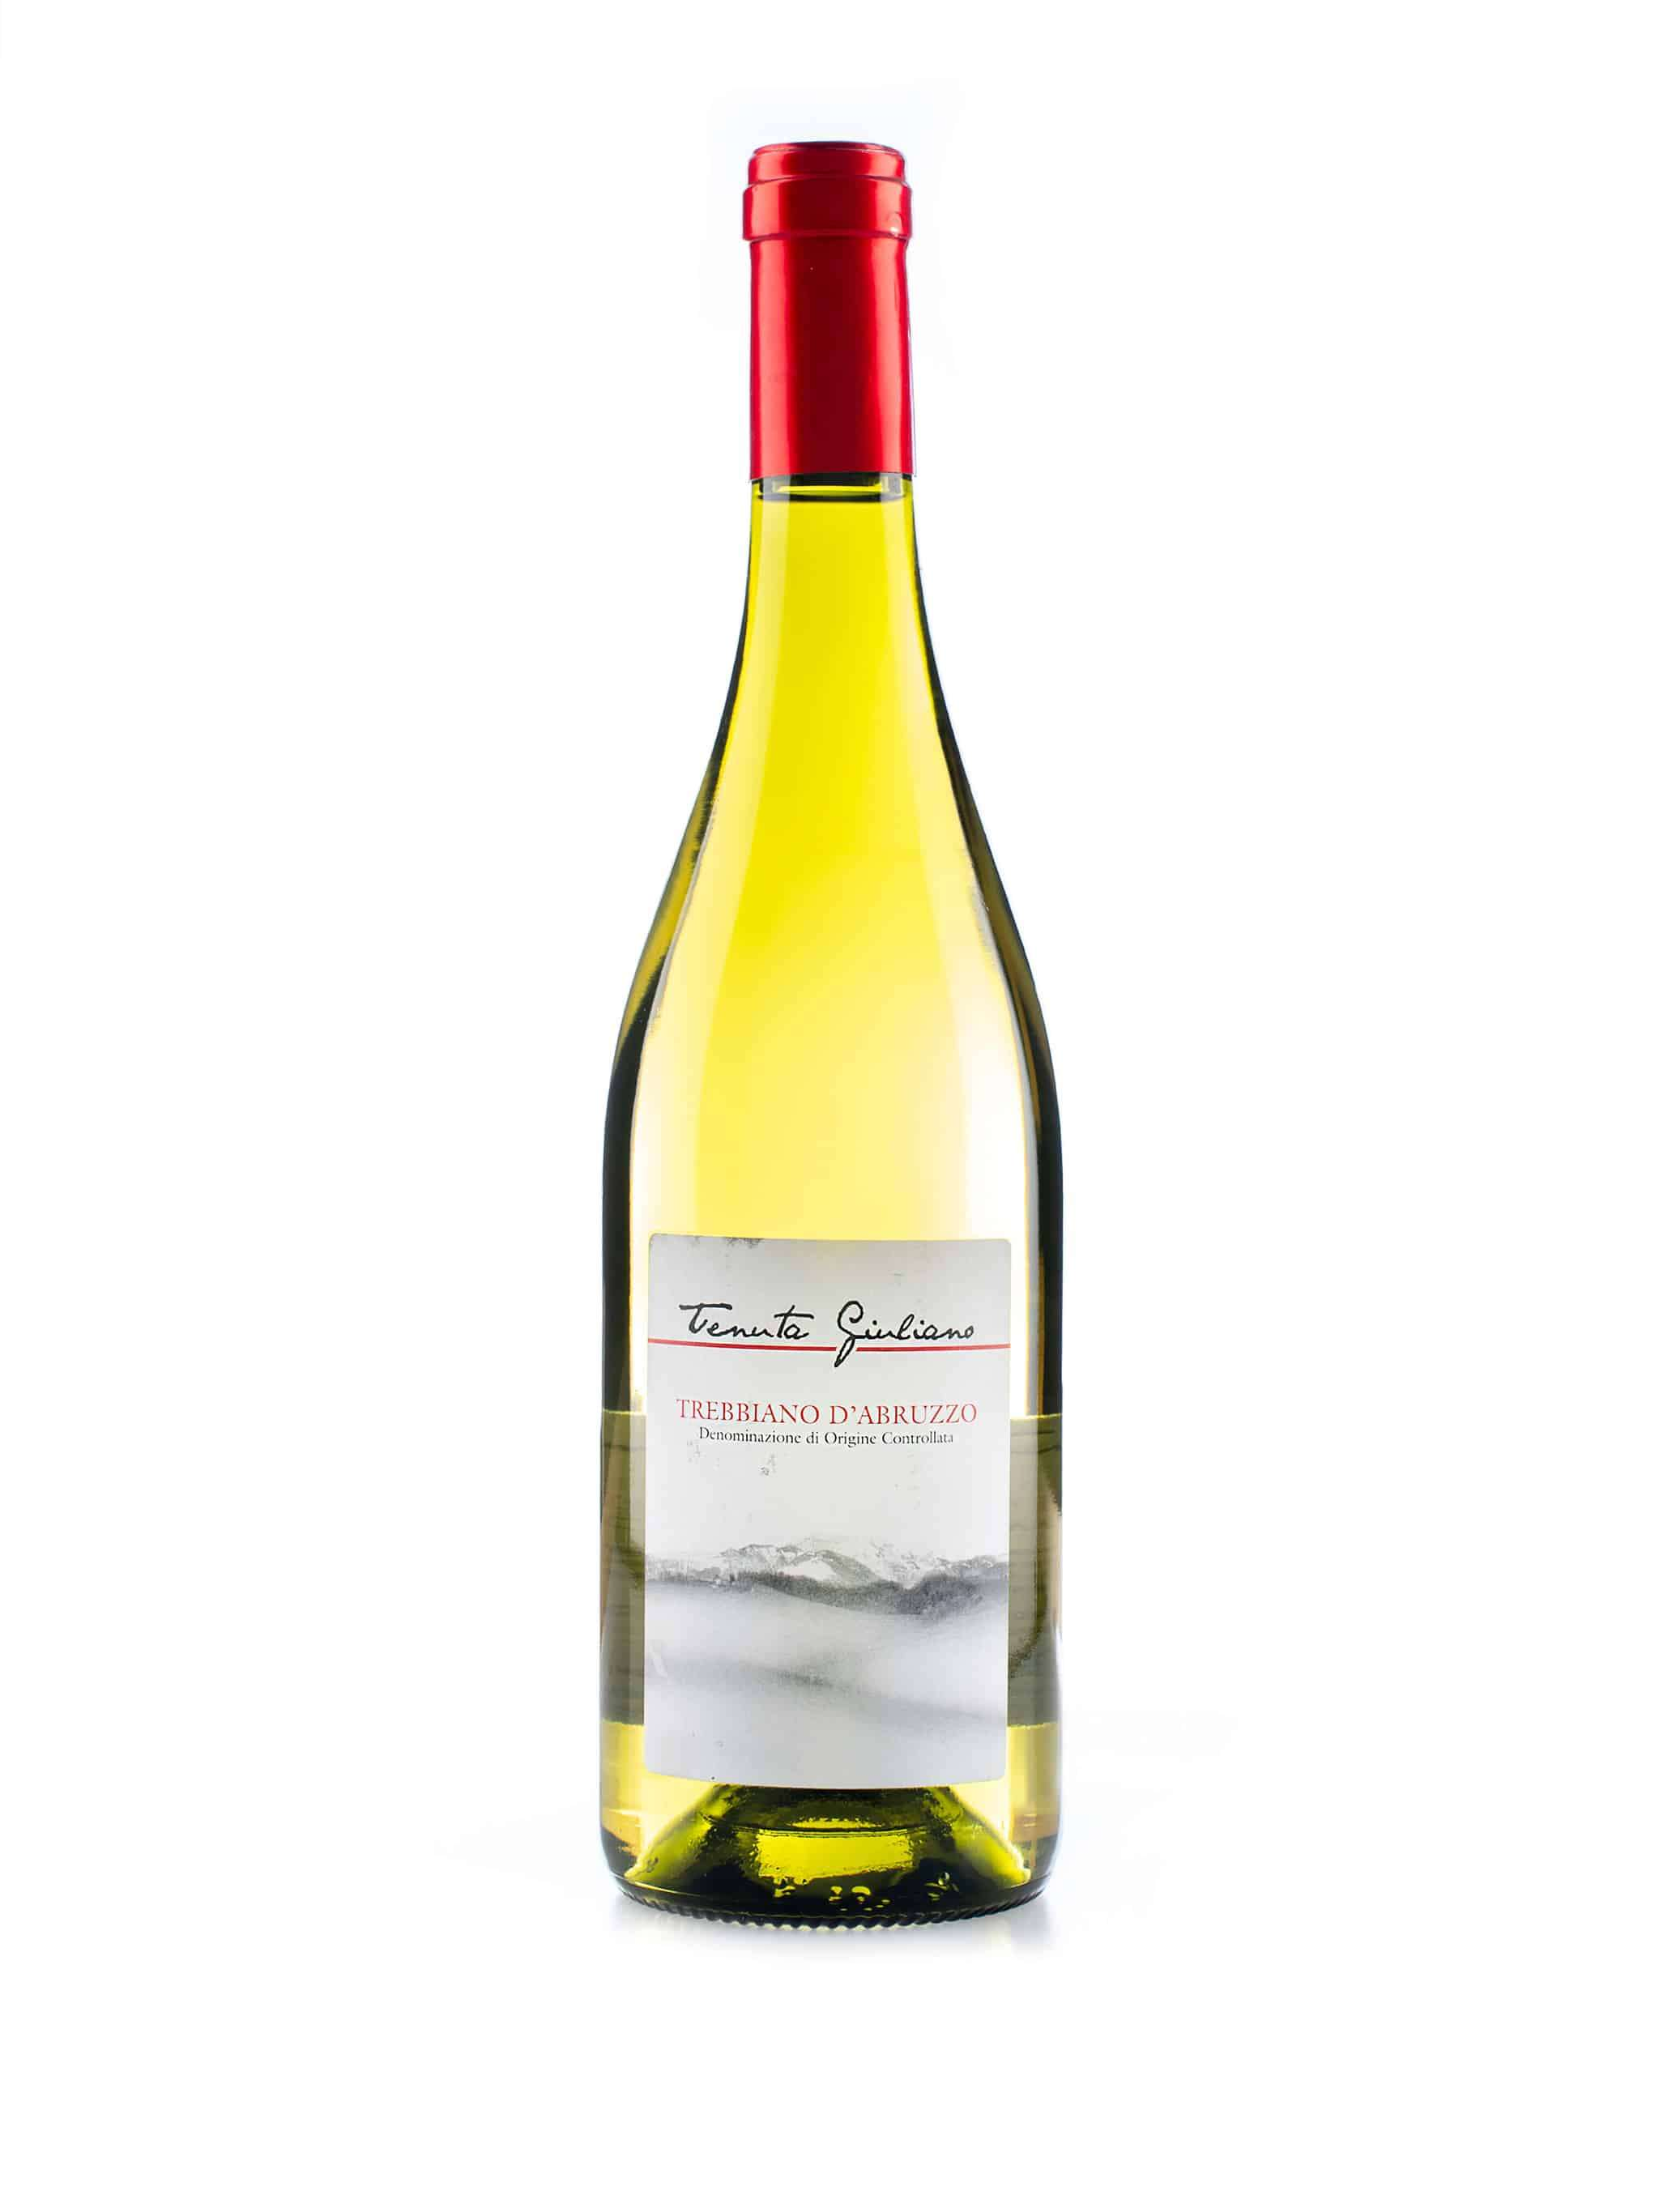 Italiaanse witte wijn van wijndomein Tenuta Giuliano: Trebbiano d'Abruzzo